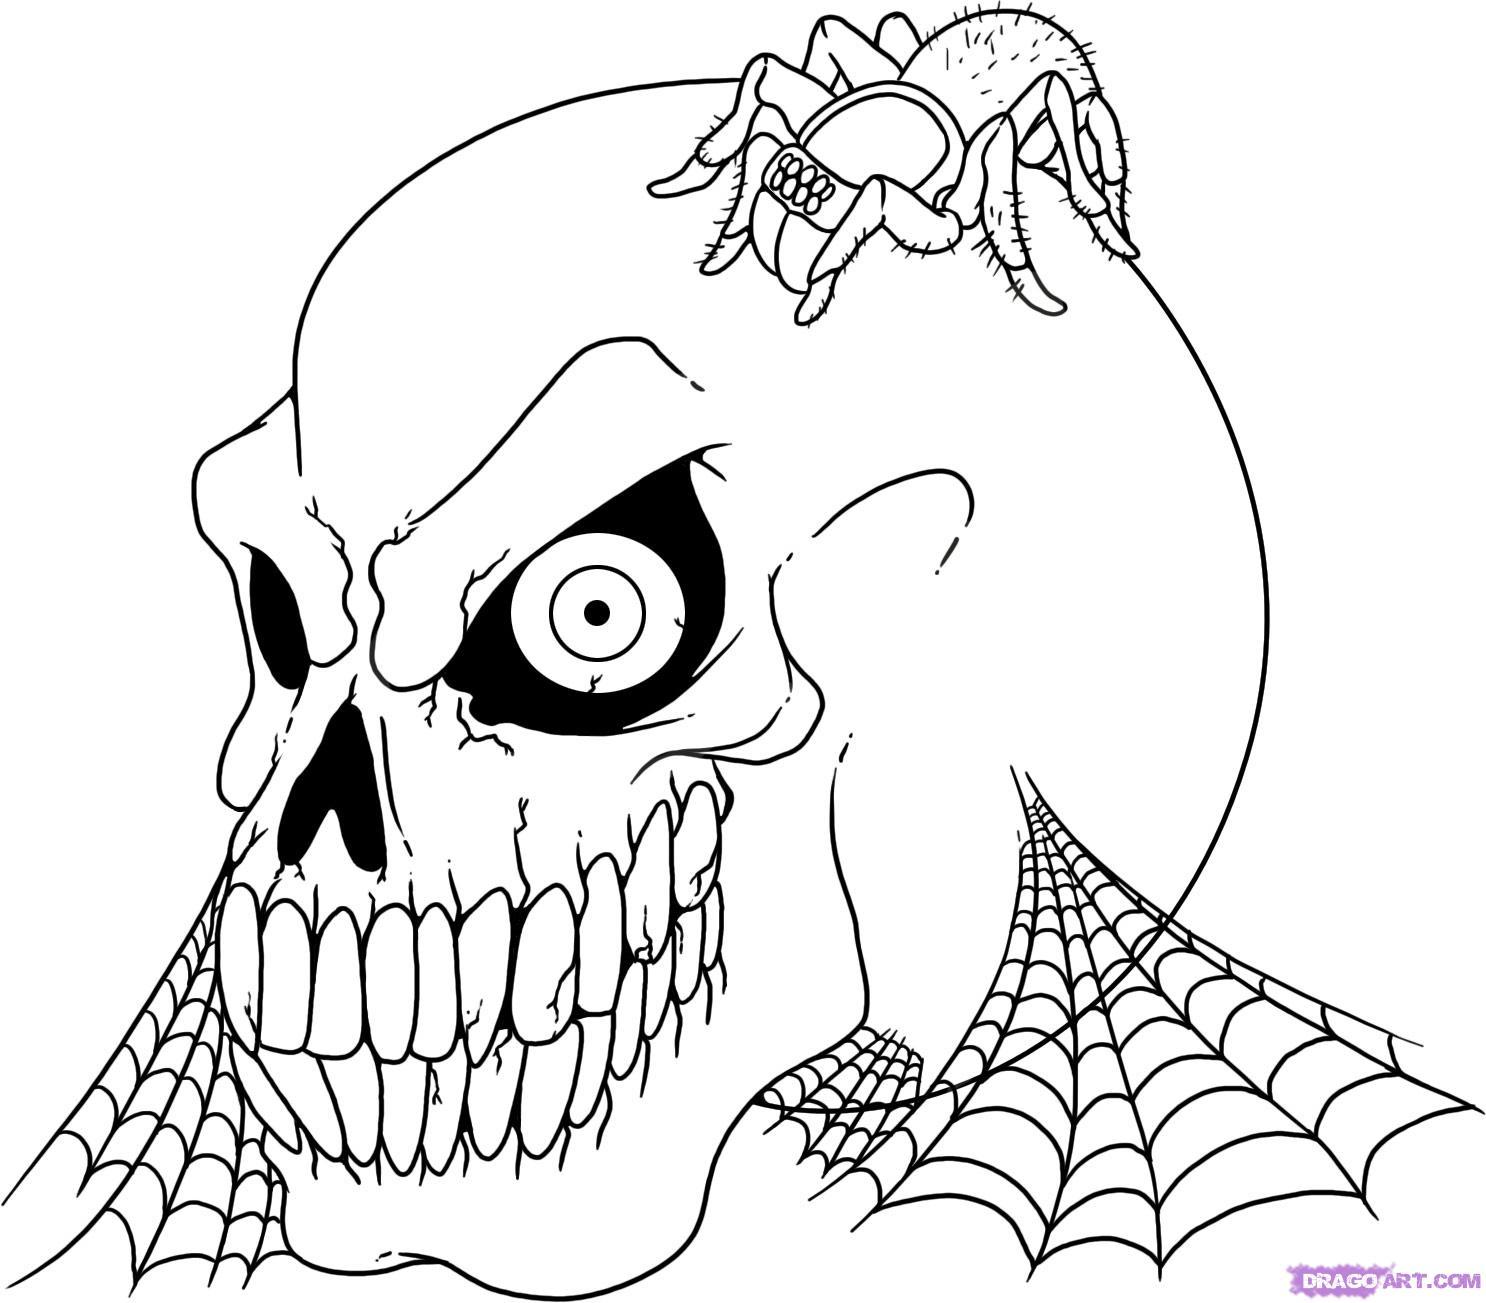 1486x1303 Drawn Skull Halloween